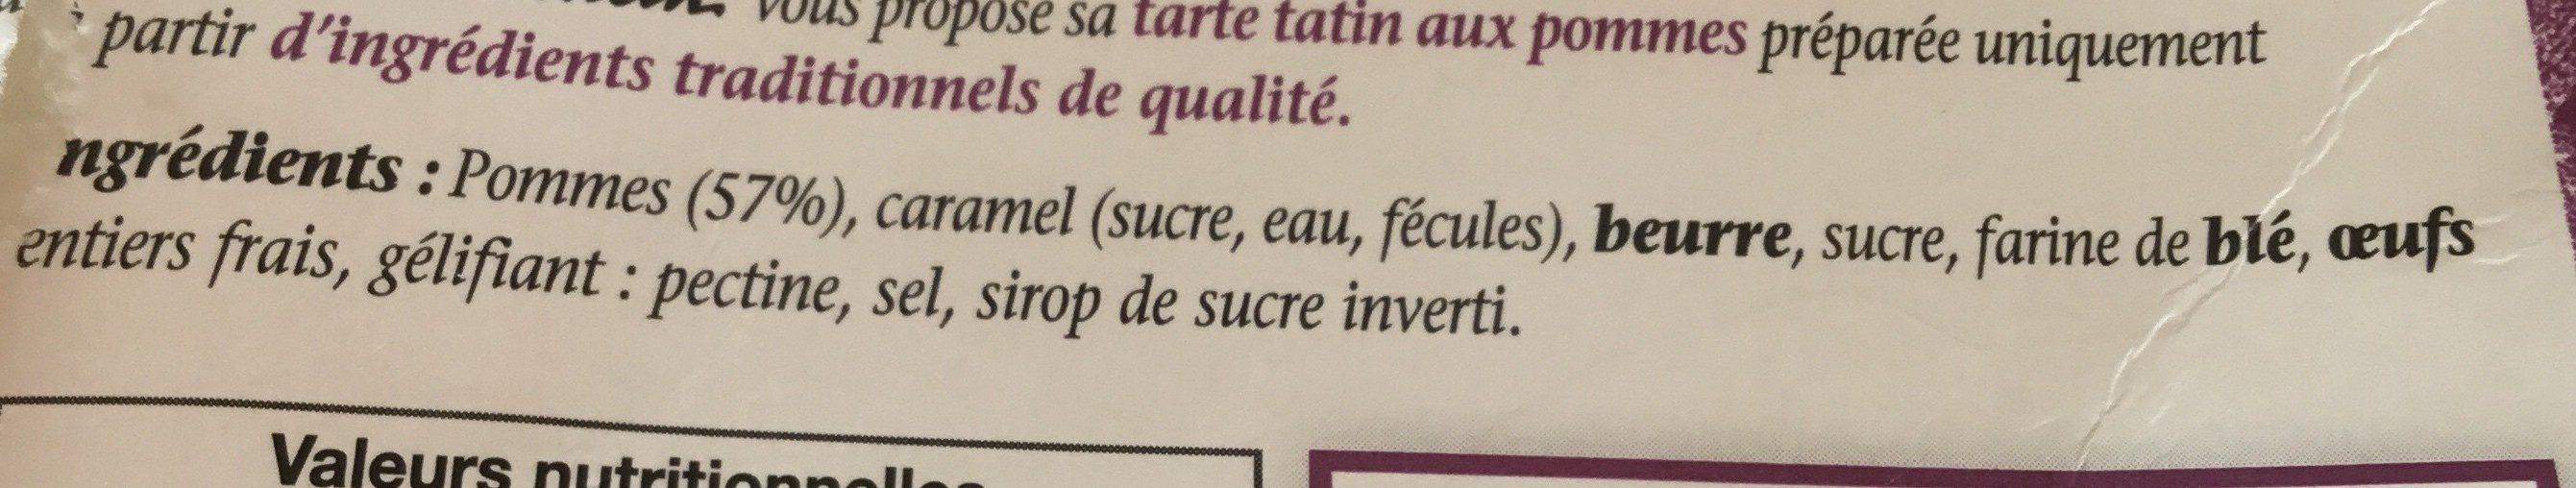 Tarte tatin aux pommes - Ingredients